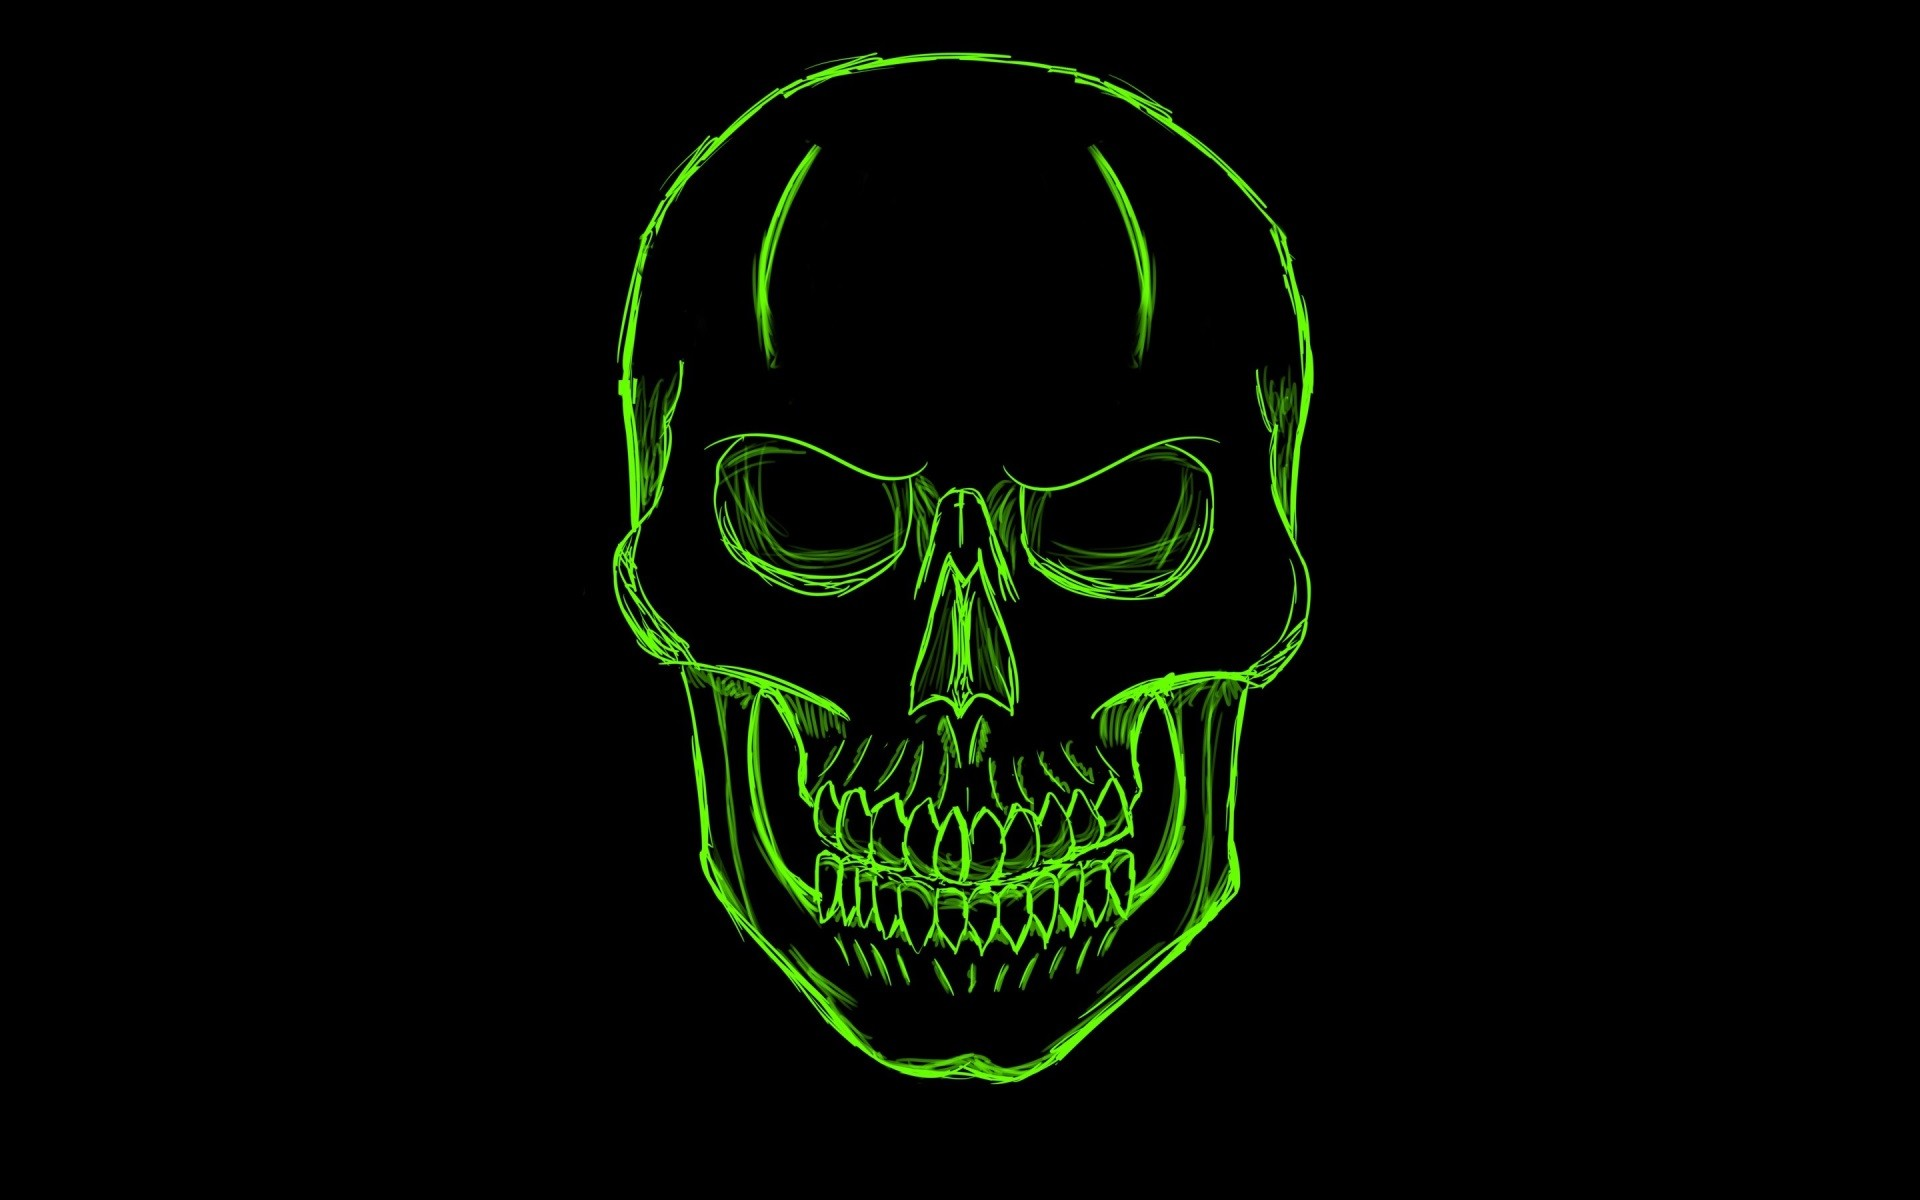 80 wallpaper 1080p skull pic | best wallpaper hd